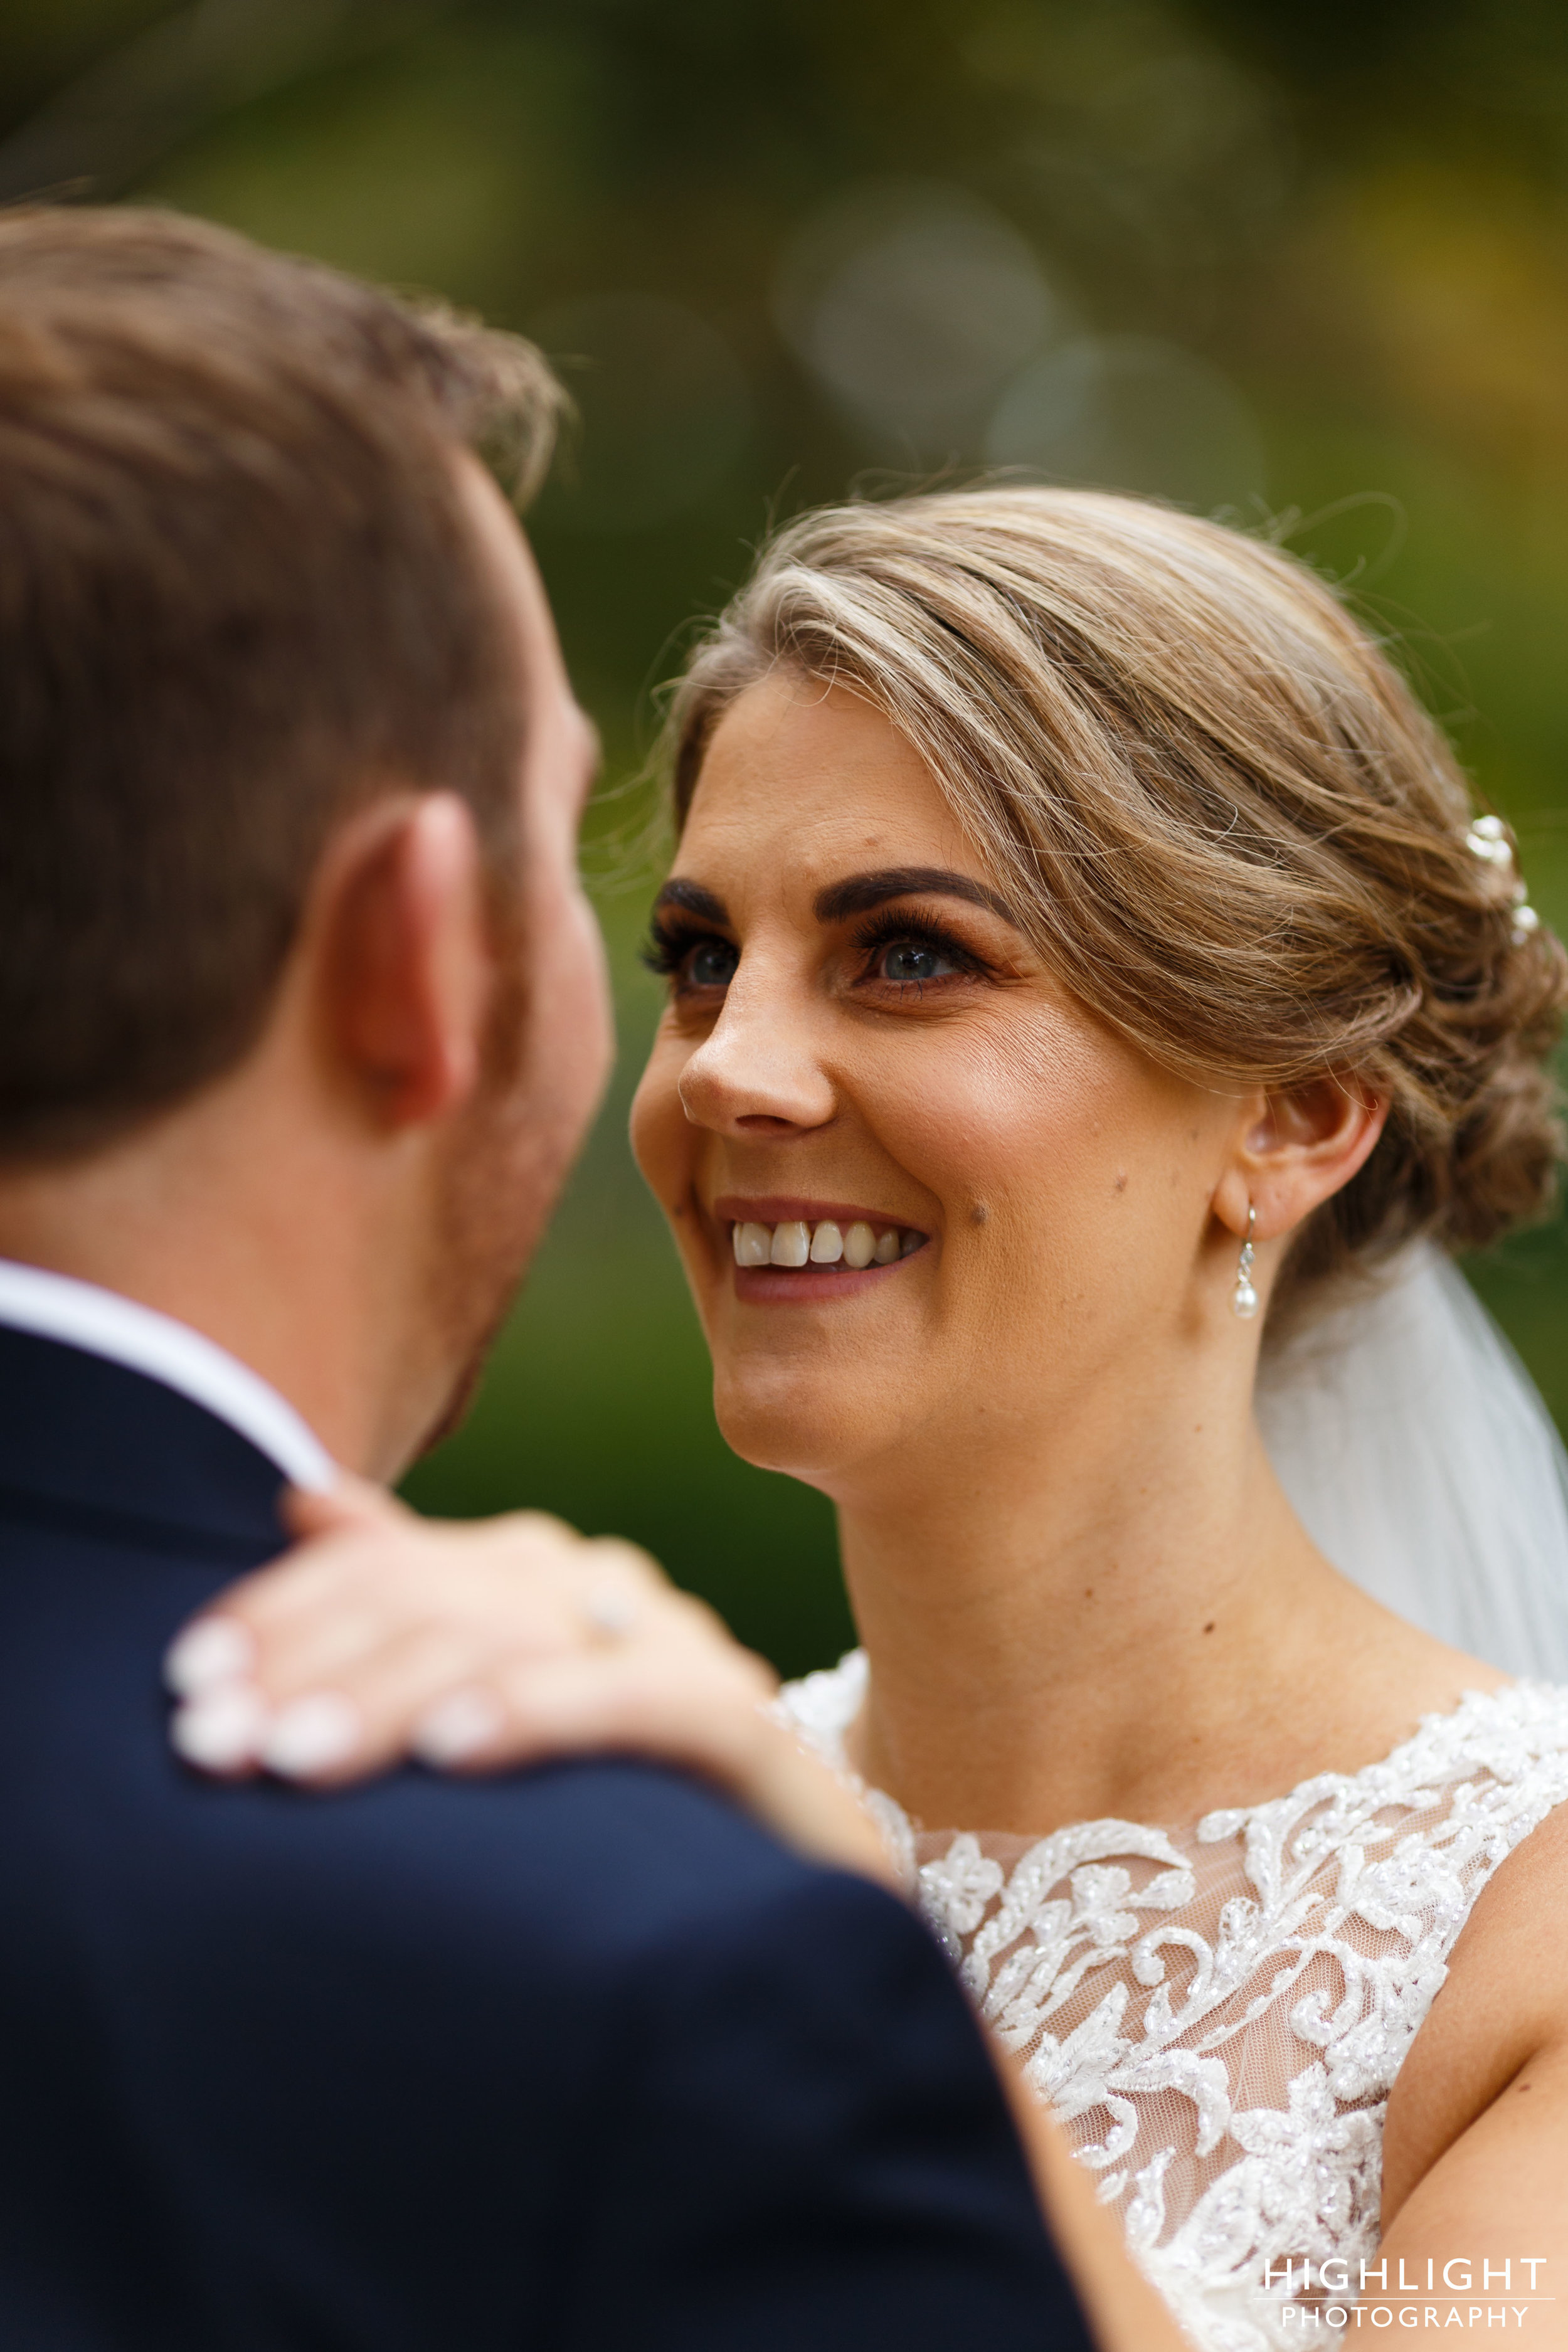 highlight-wedding-photography-palmerston-north-new-zealand-orlando-country-club-wedding-62.jpg